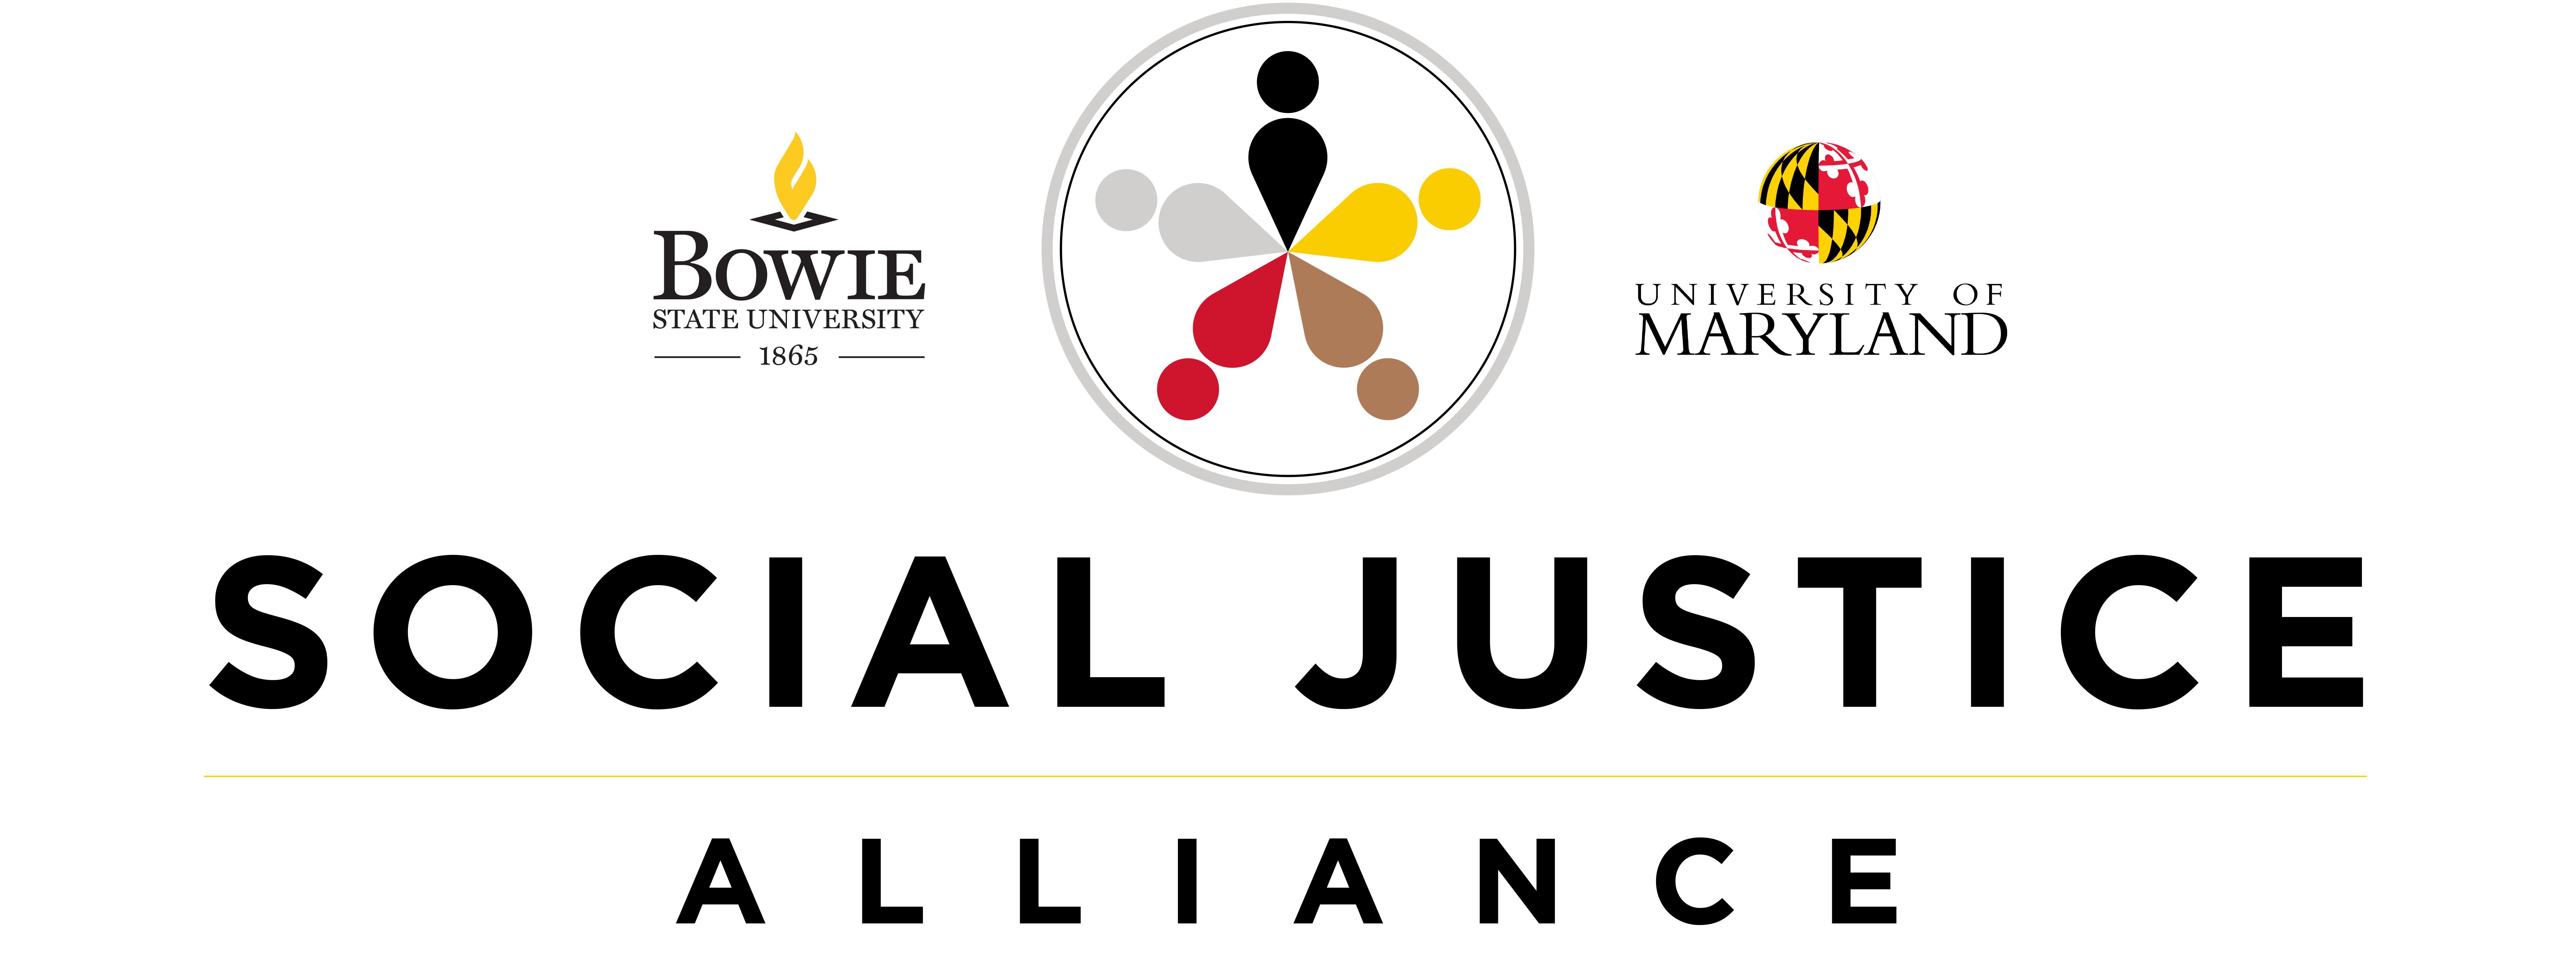 social justice alliance logo